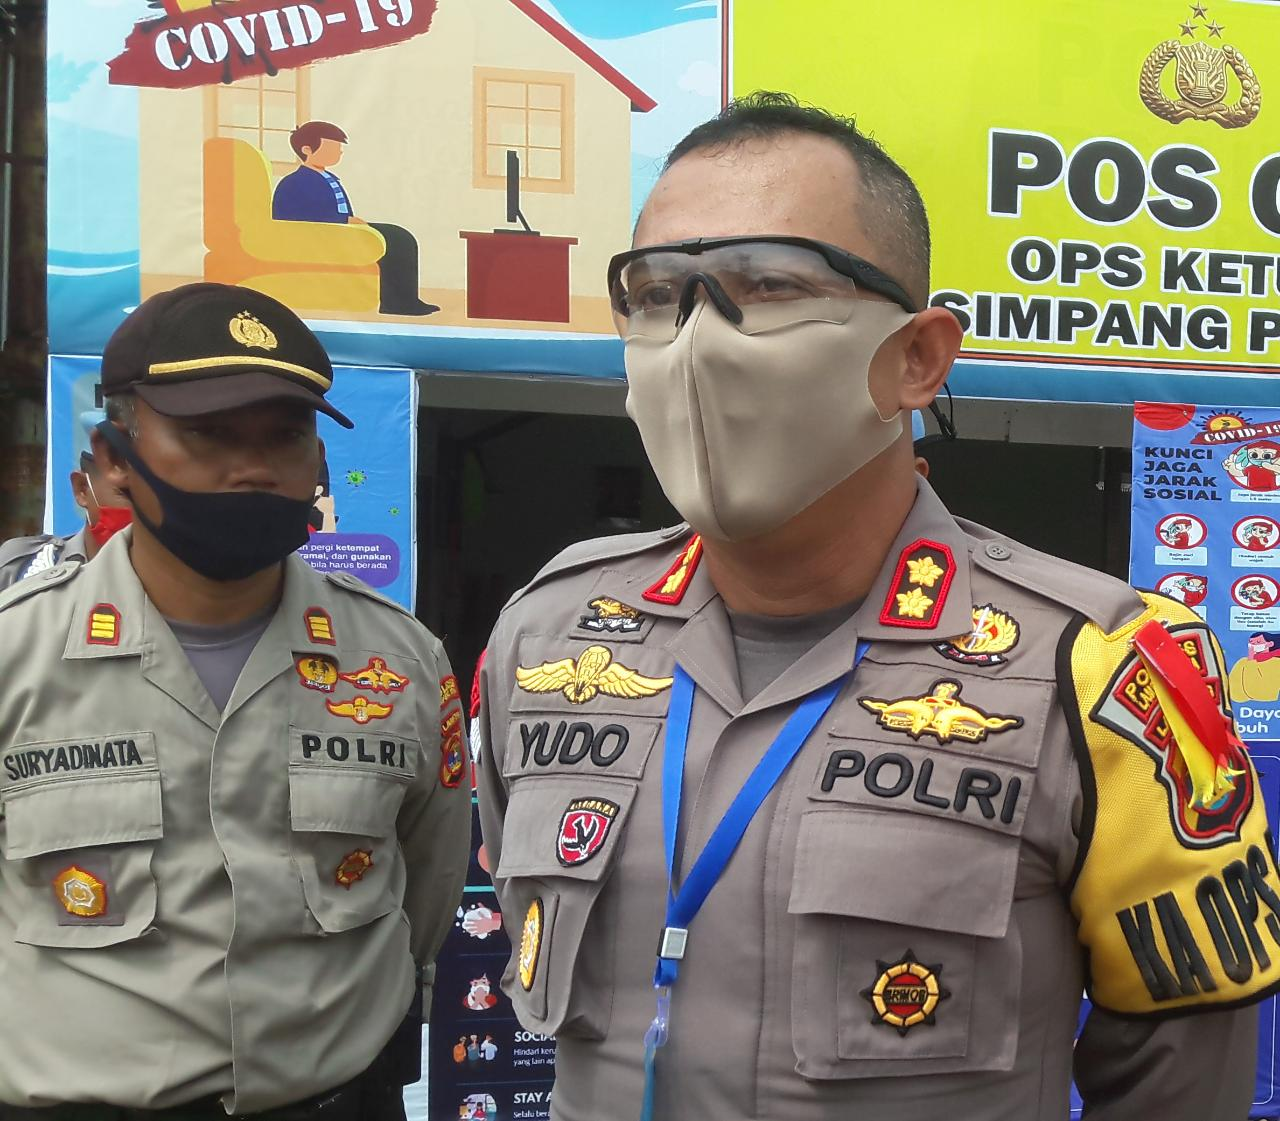 Kapolres Lampung Utara Cek Kesiapan Pos Pam Operasi Ketupat Krakatau 2020